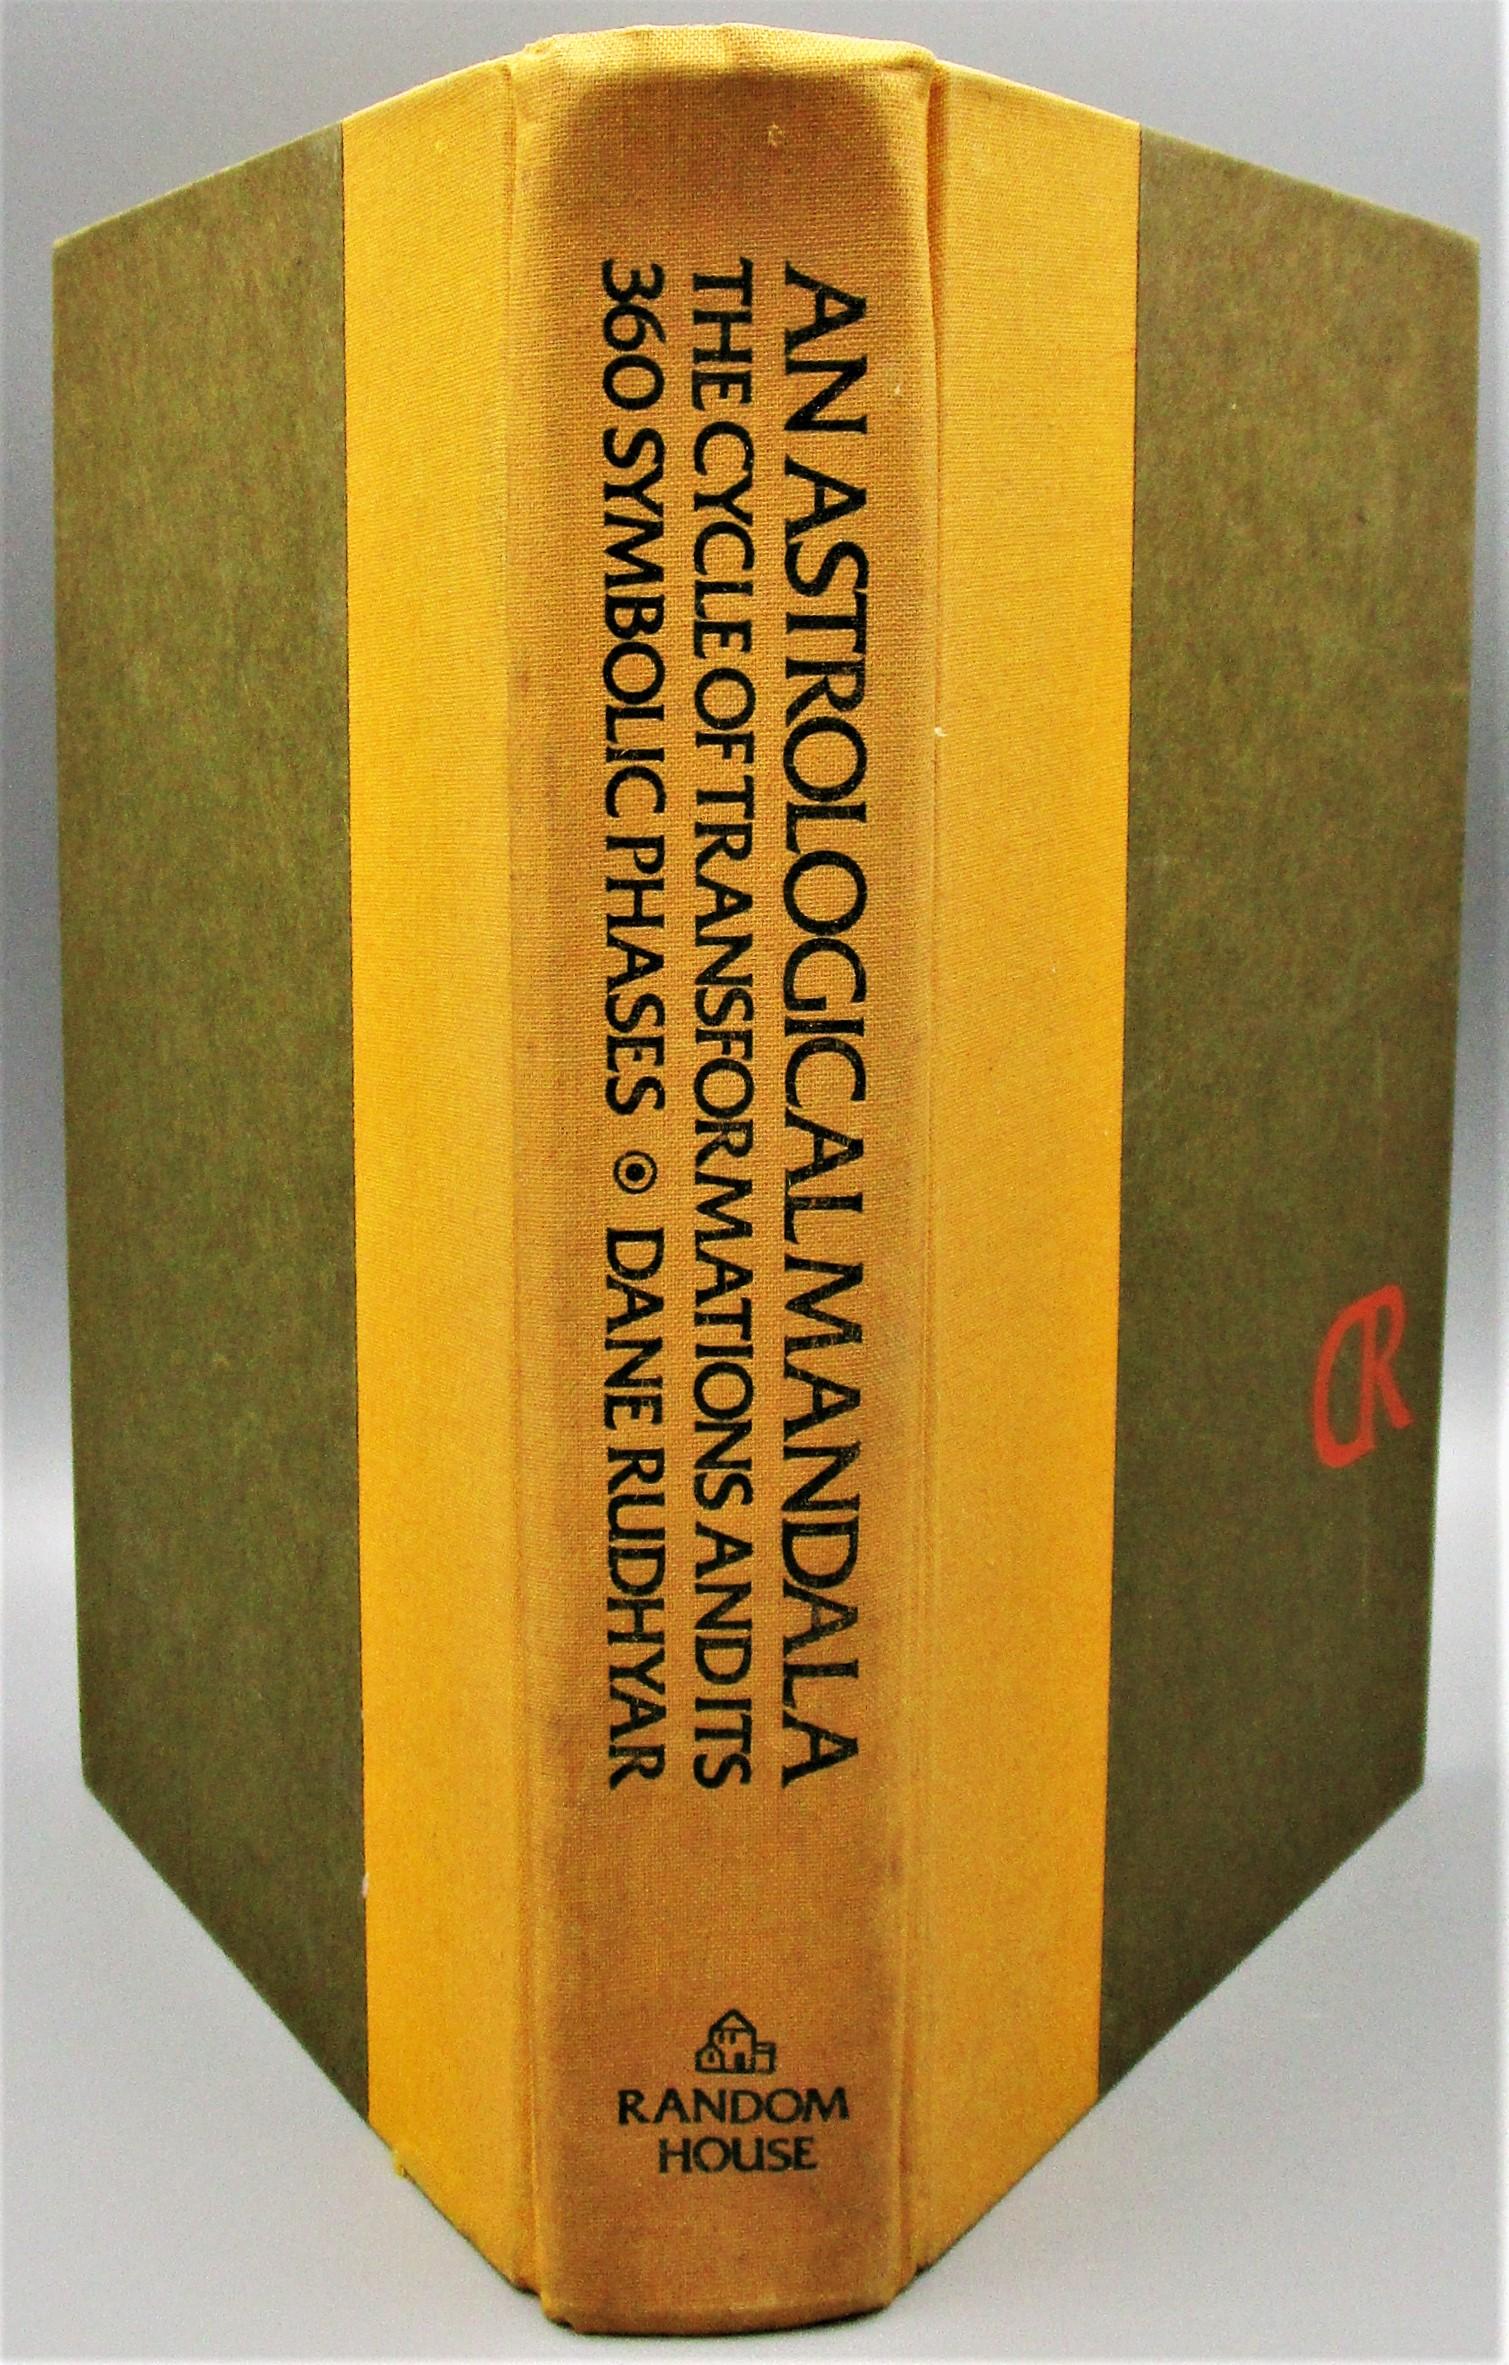 AN ASTROLOGICAL MANDALA, by Dane Rudhyar - 1973 [1st Ed]